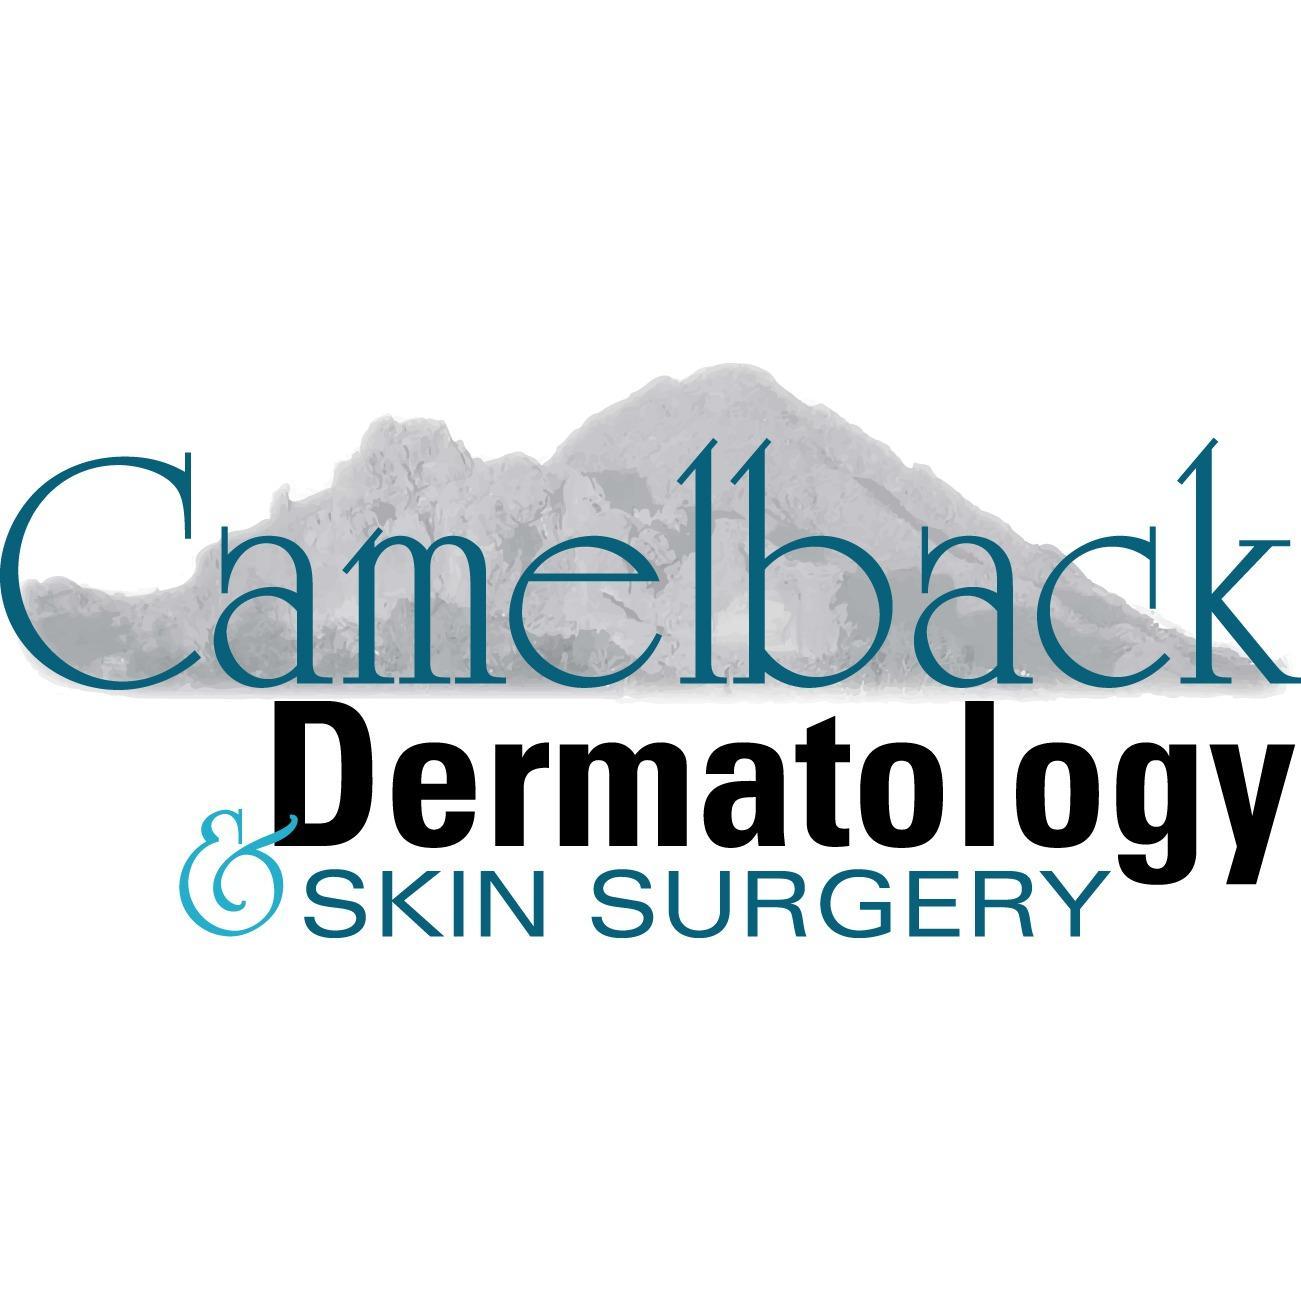 Camelback Dermatology & Skin Center